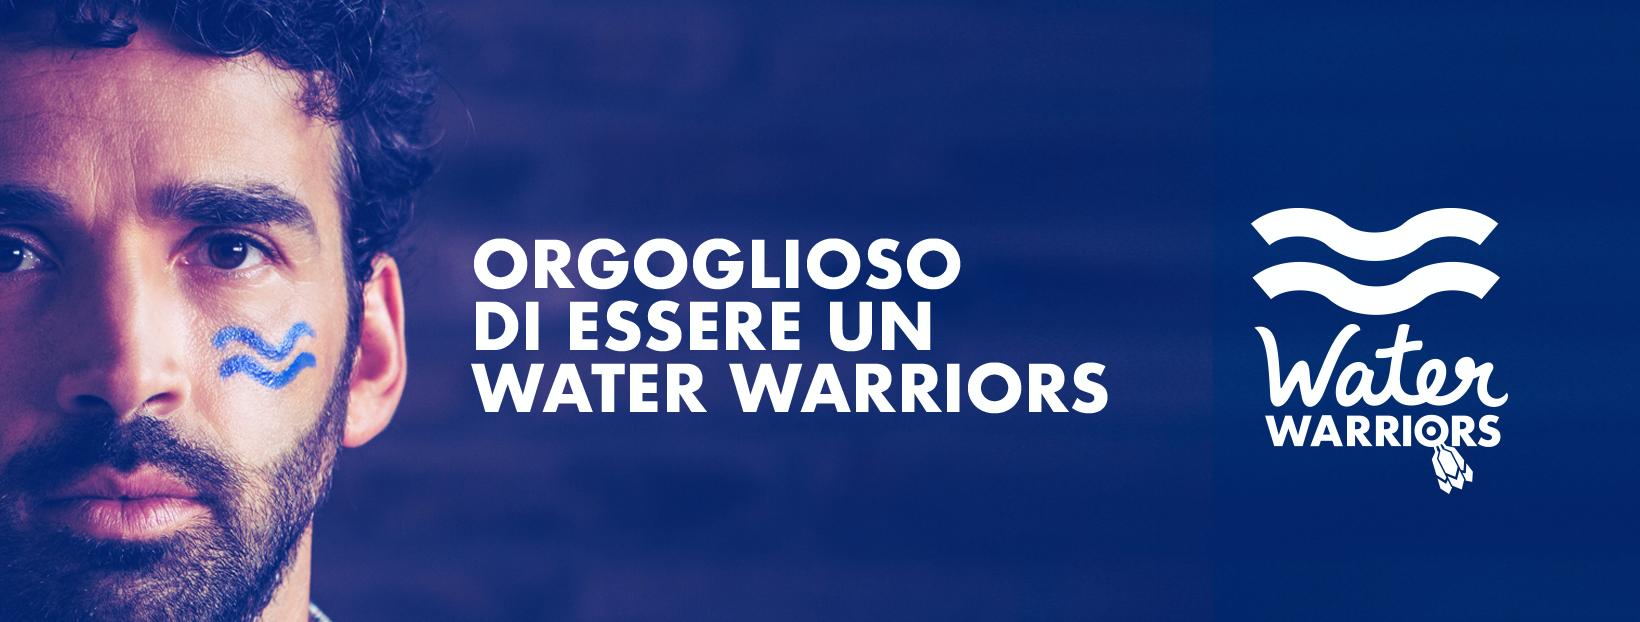 water-warrior